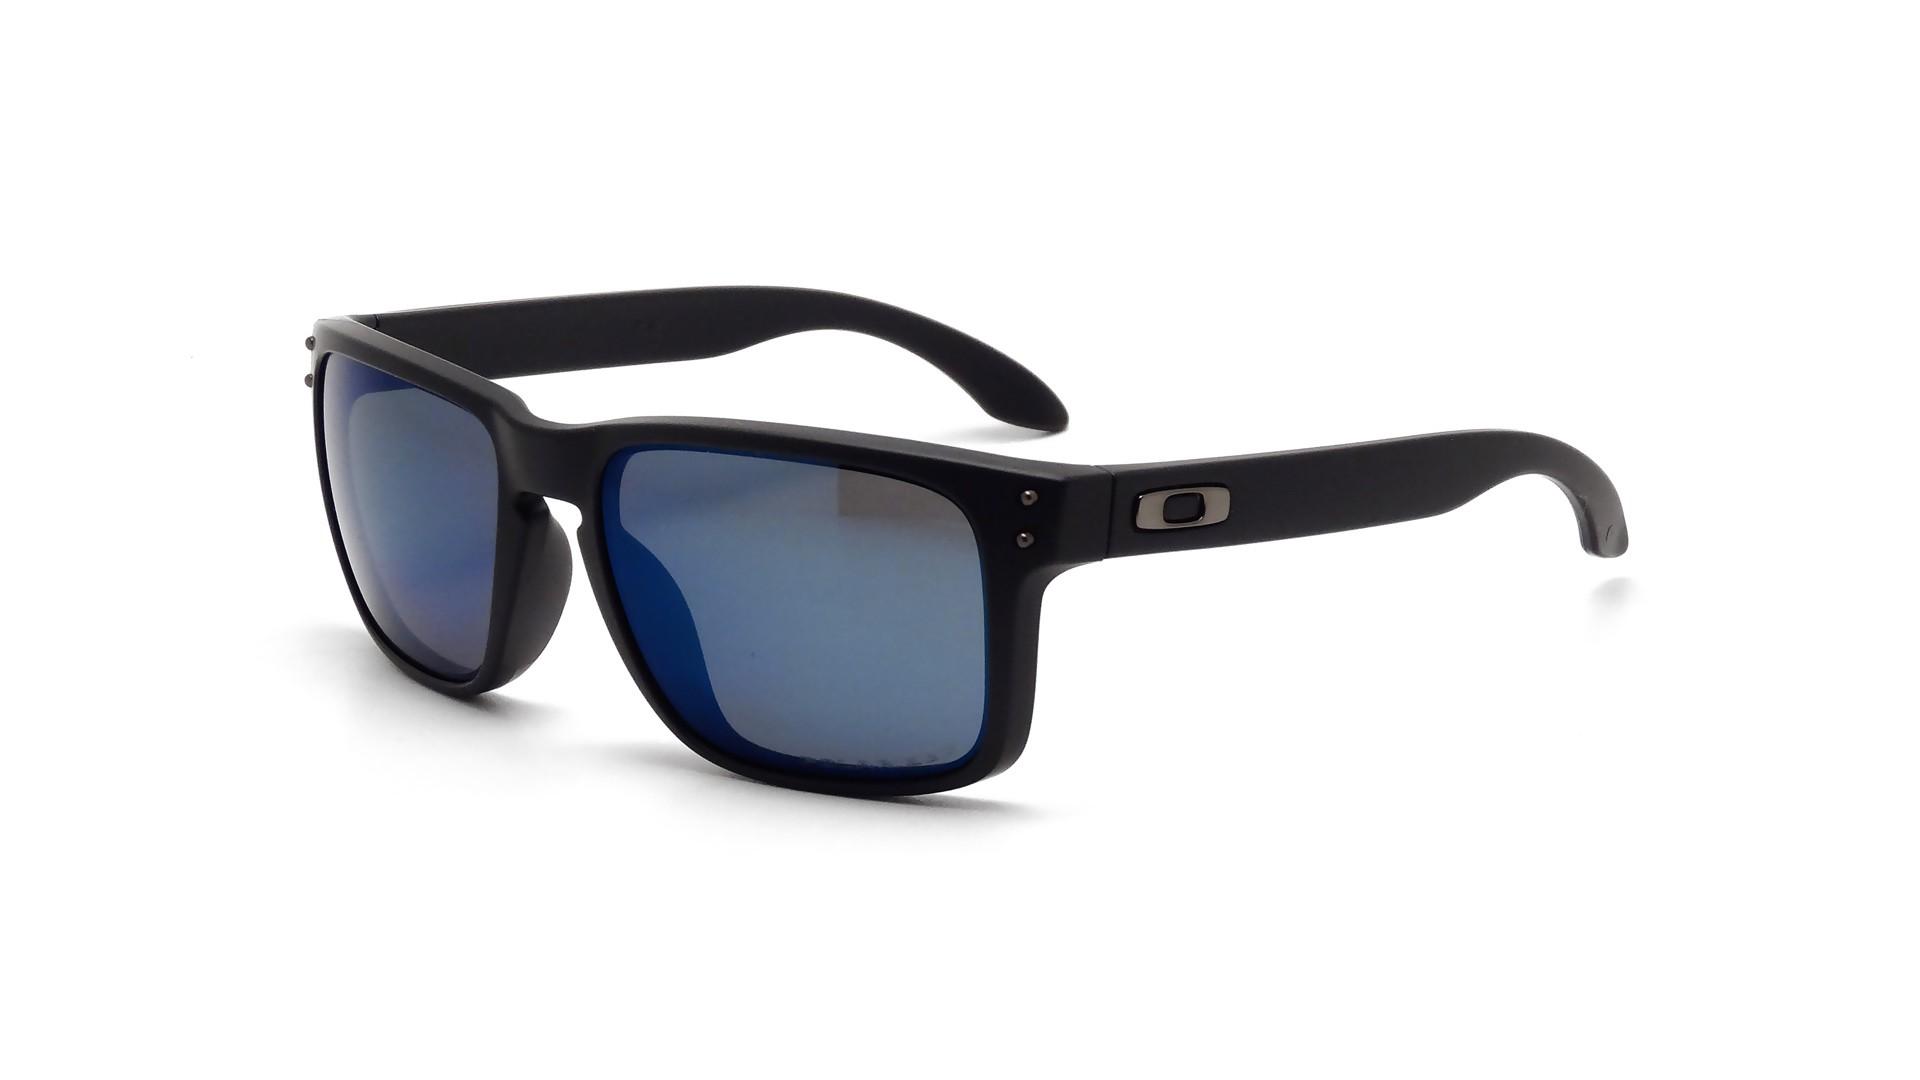 884a3480cd Sunglasses Oakley Holbrook Black OO9102 52 55-18 Medium Polarized Mirror